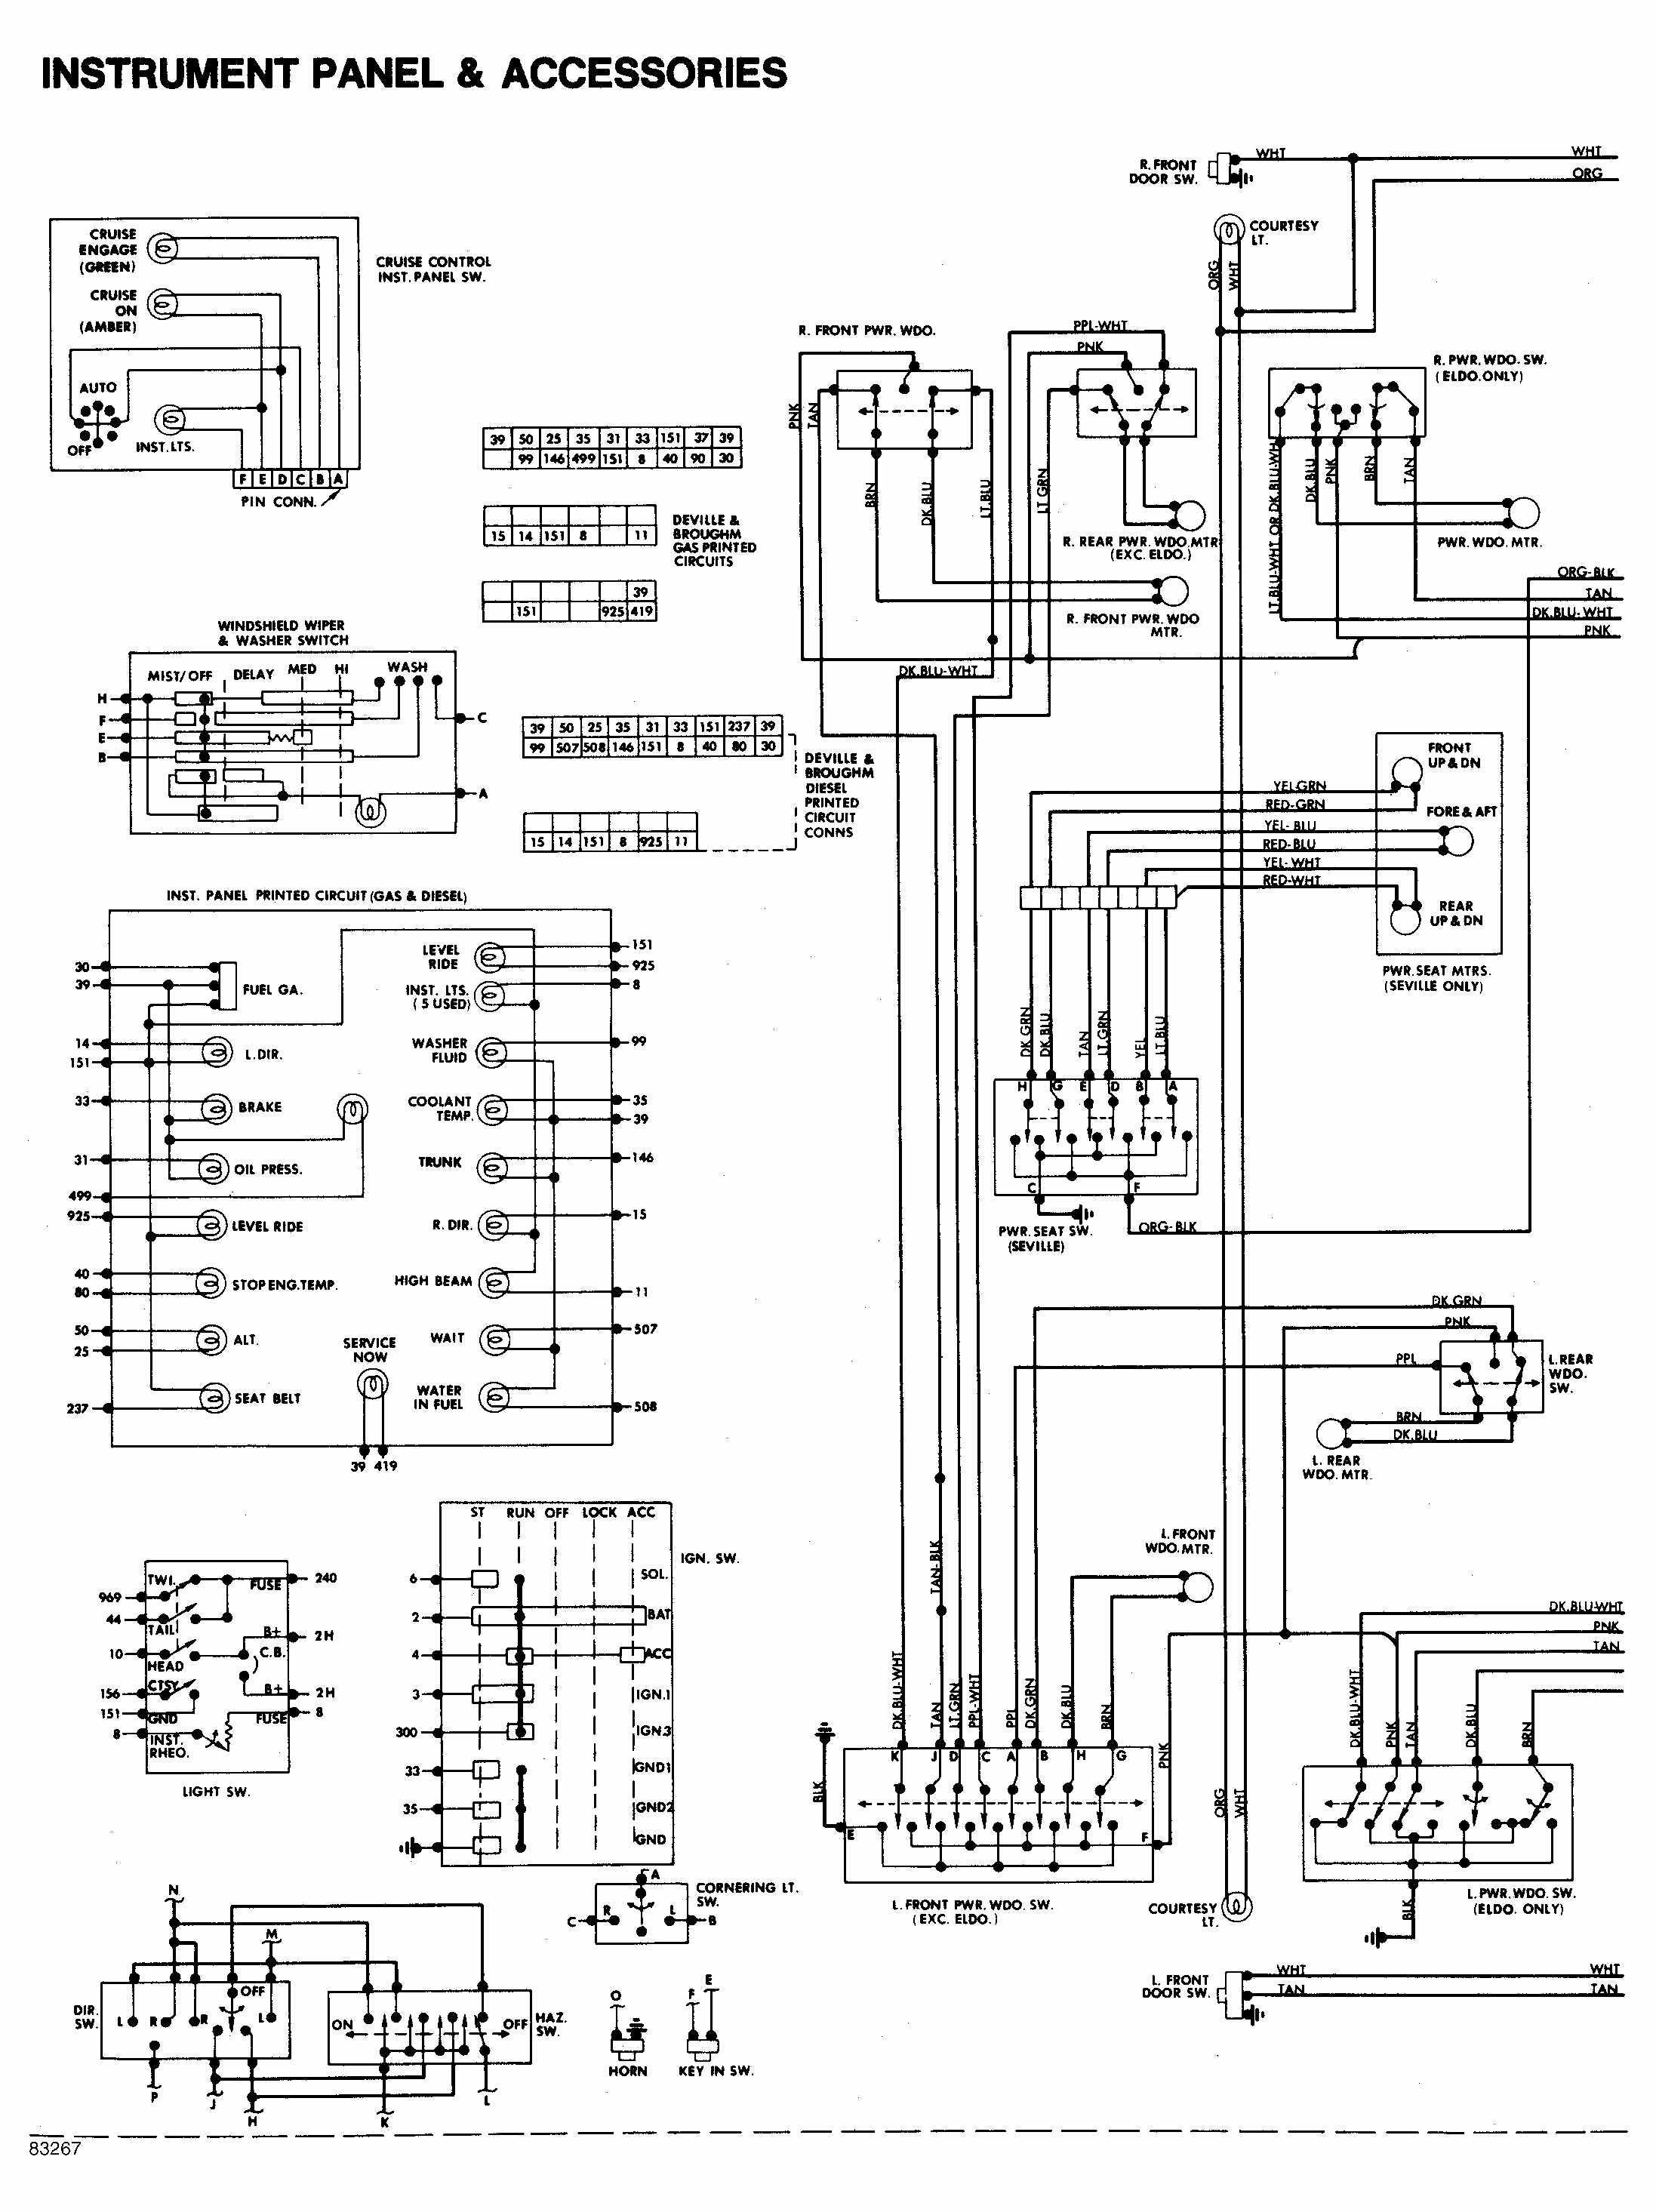 Pierce Fire Truck Wiring Diagram Wiring Diagram as Well 1984 Corvette Headlight Wiring Diagram Of Pierce Fire Truck Wiring Diagram